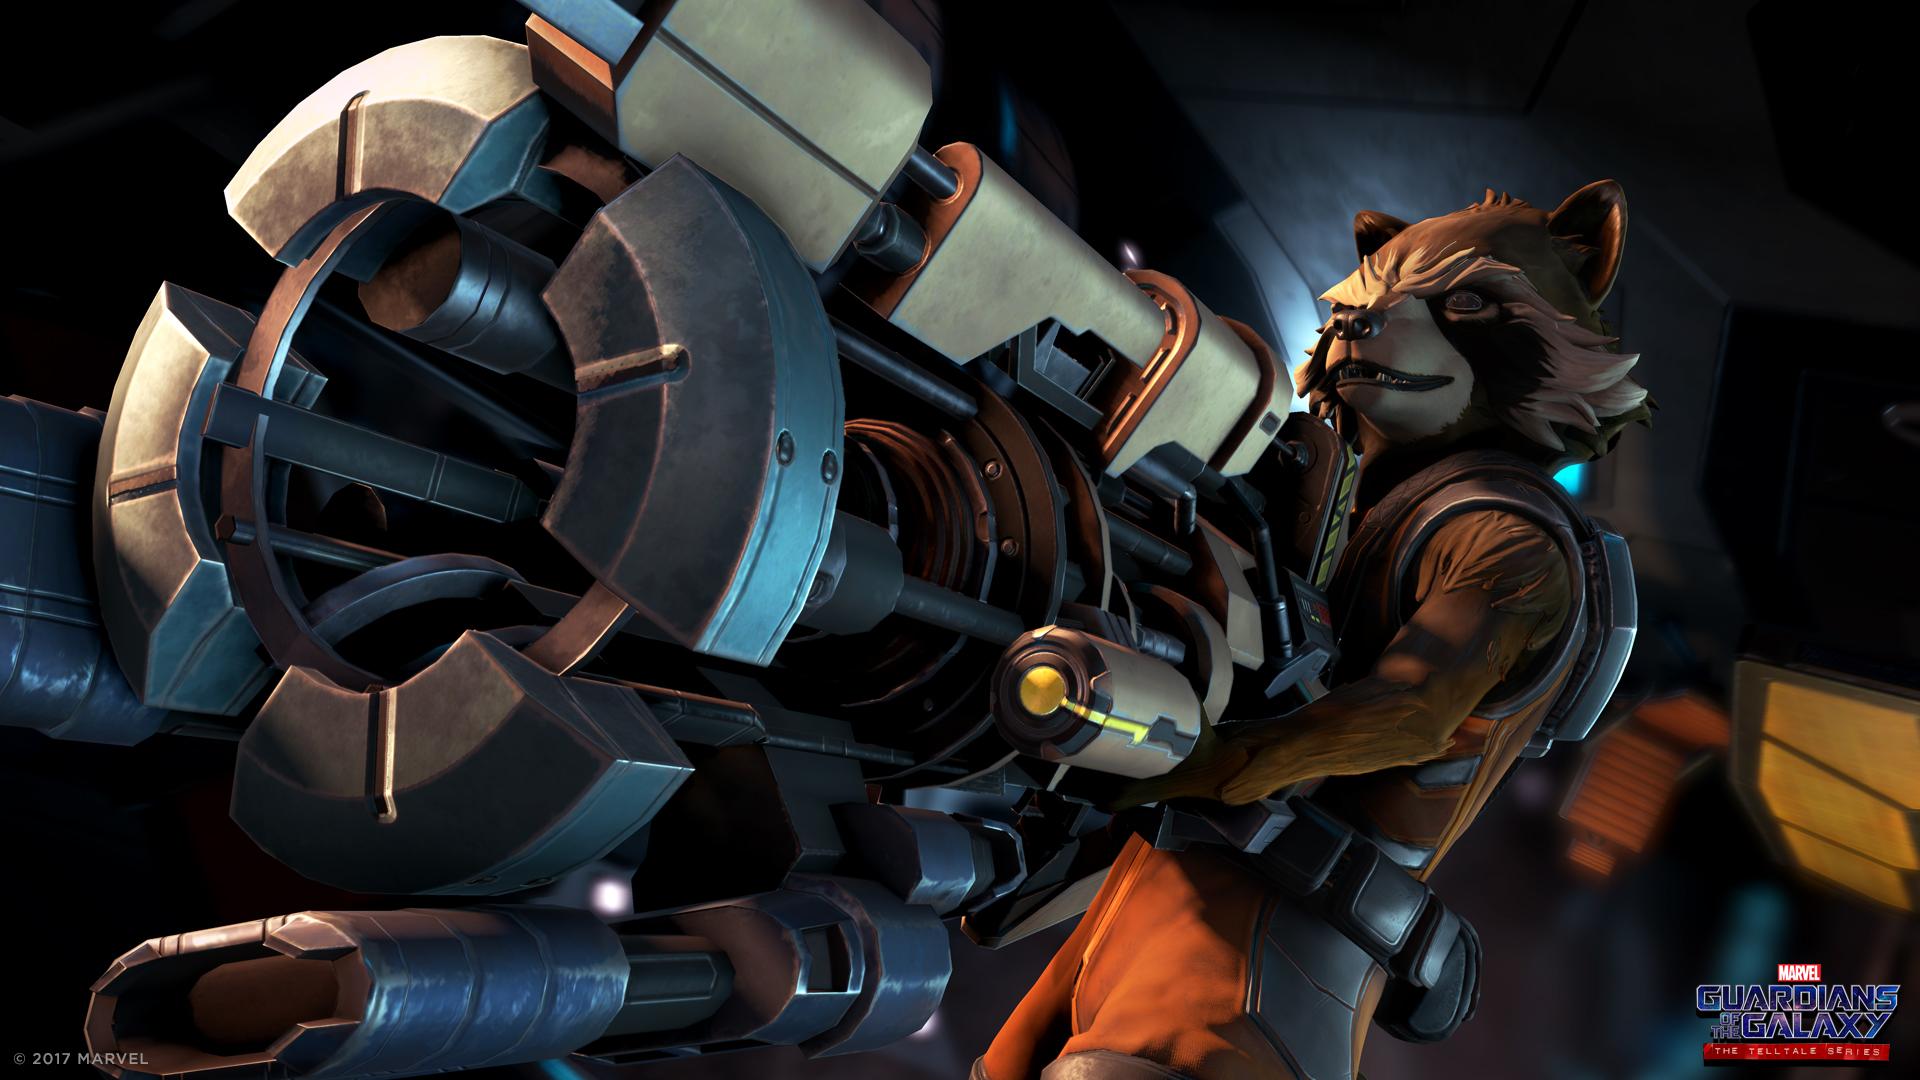 Strážci Galaxie od Telltale Games na prvních screenshotech 139996